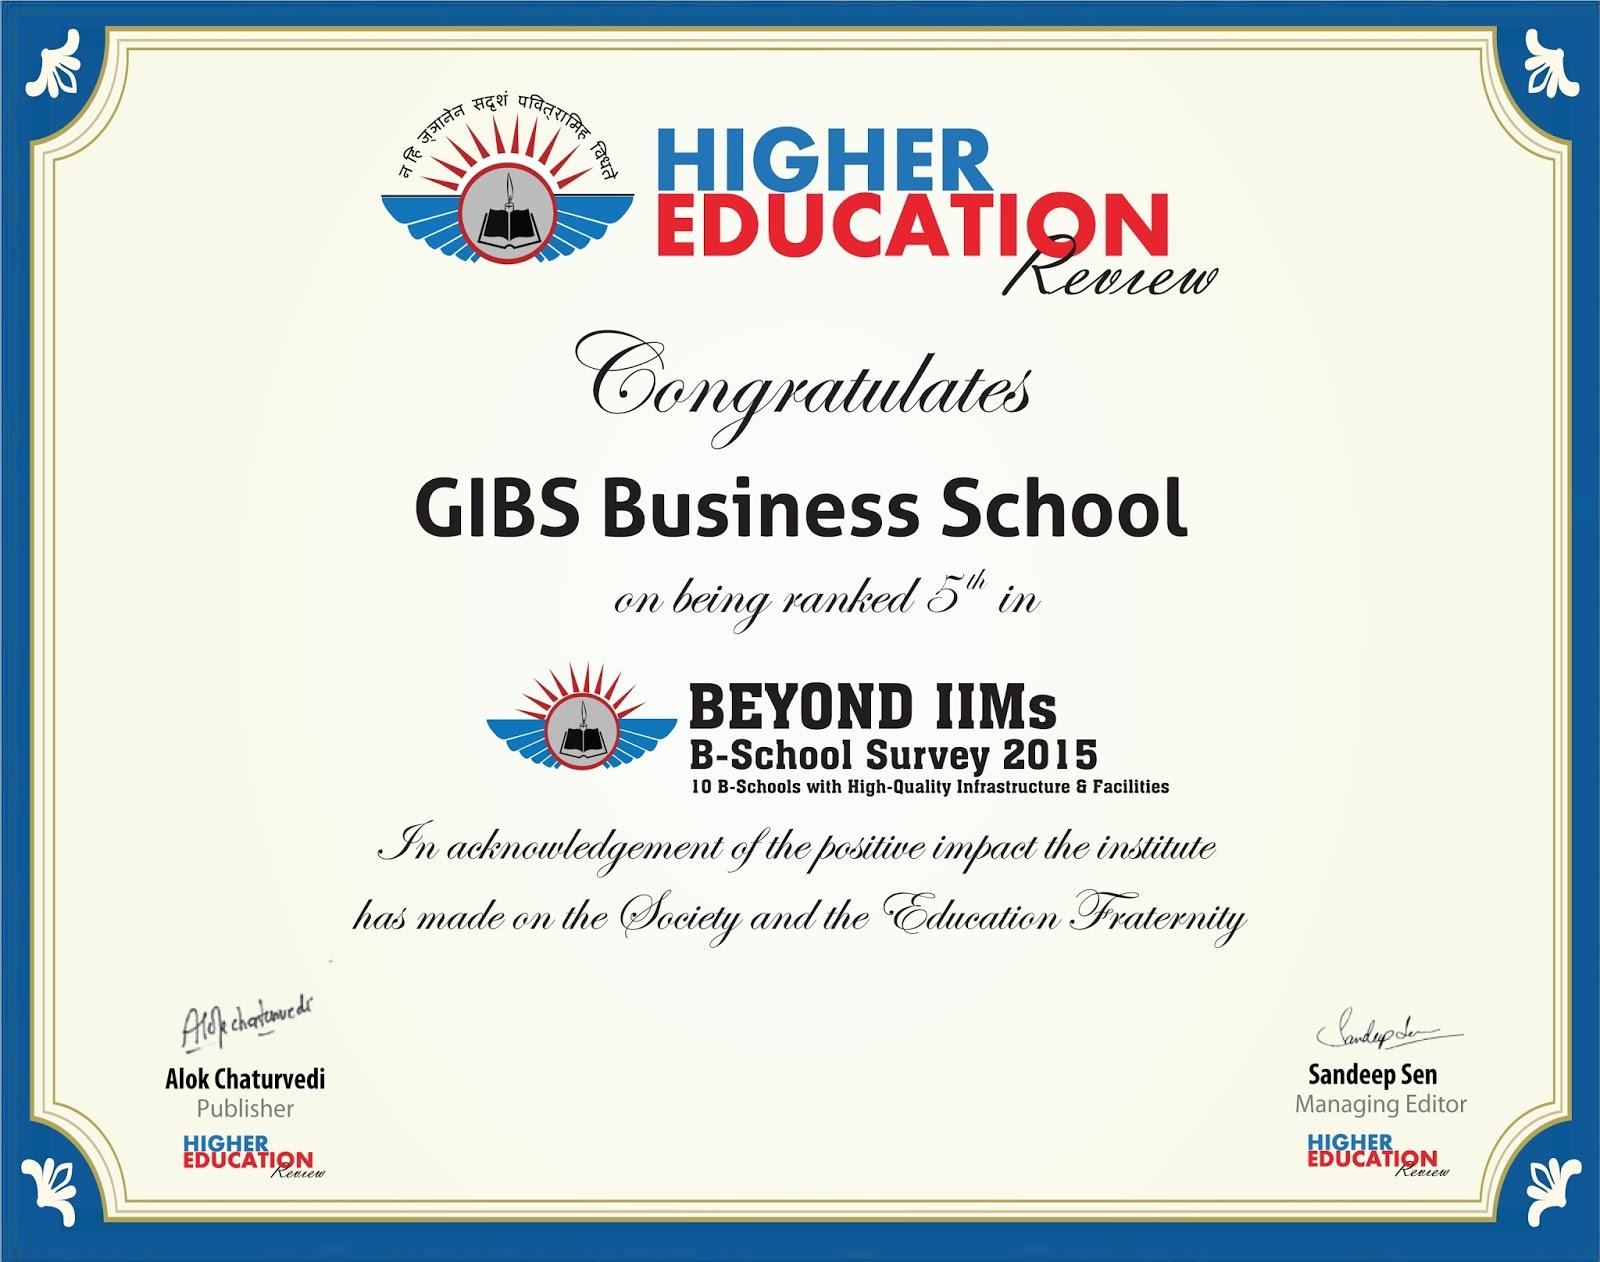 GIBS Business School, Bangalore: GIBS Business School